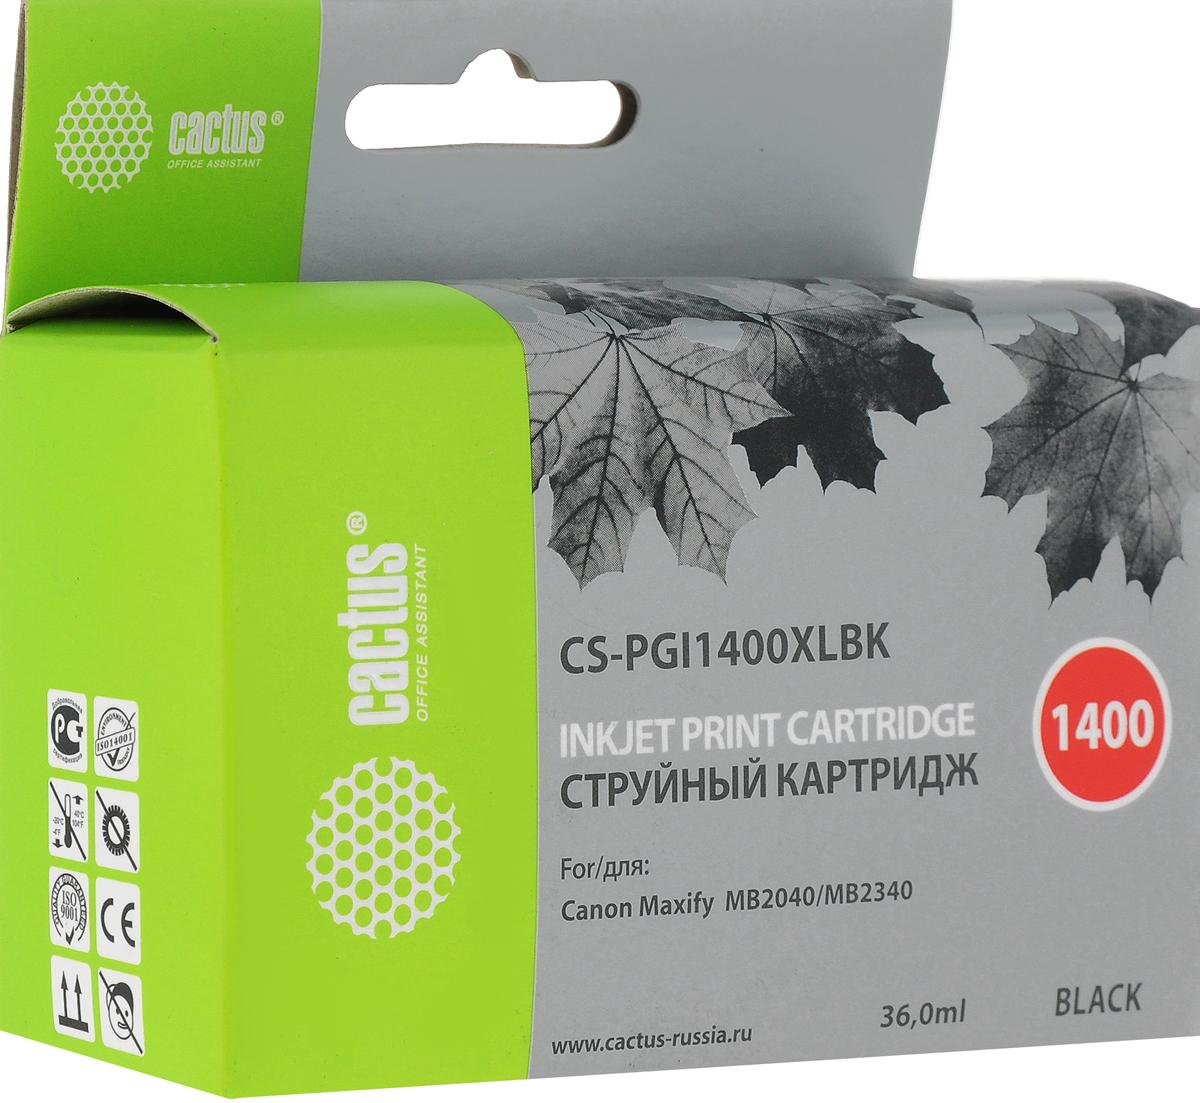 Cactus CS-PGI1400XLBK, Black картридж струйный для Canon MB2050/MB2350/MB2040/MB2340 картридж для принтера и мфу cactus cs tn2275 black